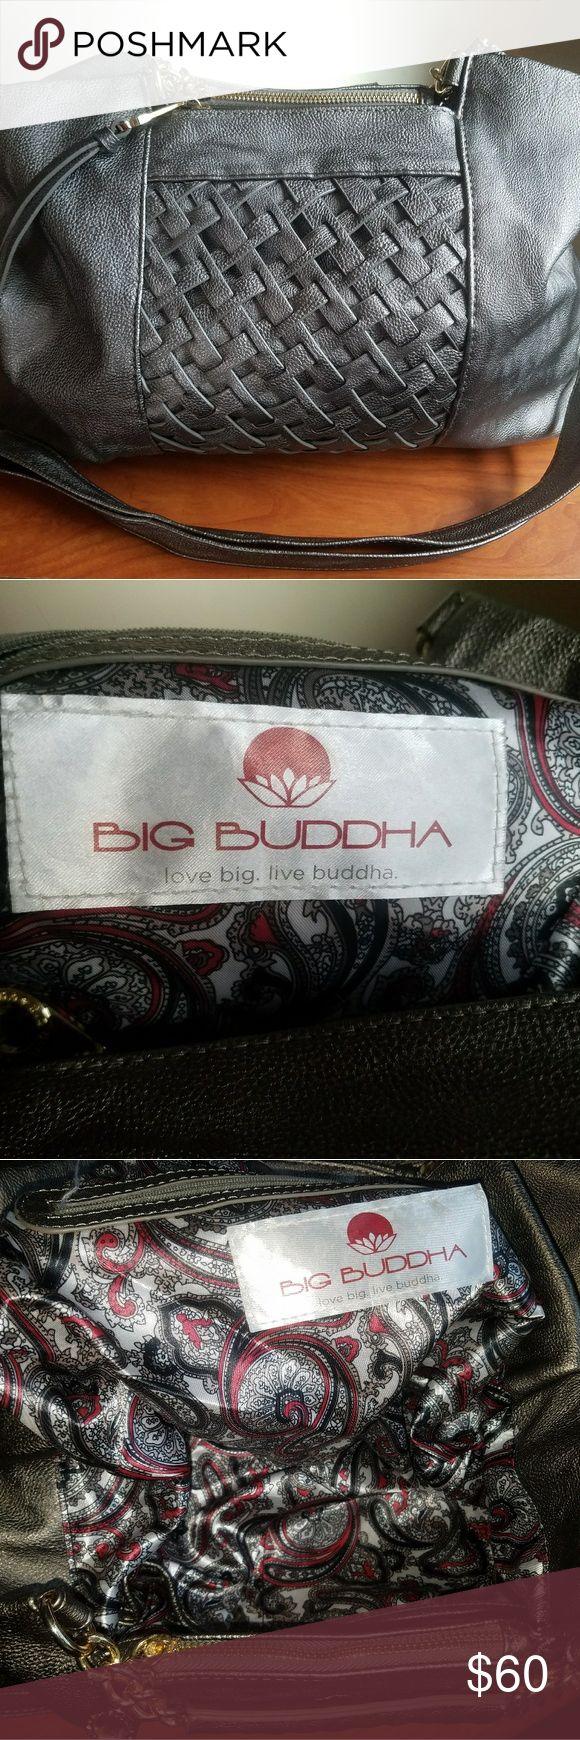 Big buddha purse Silver/gray big buddha over sizes purse new without tags. Big Buddha Bags Hobos